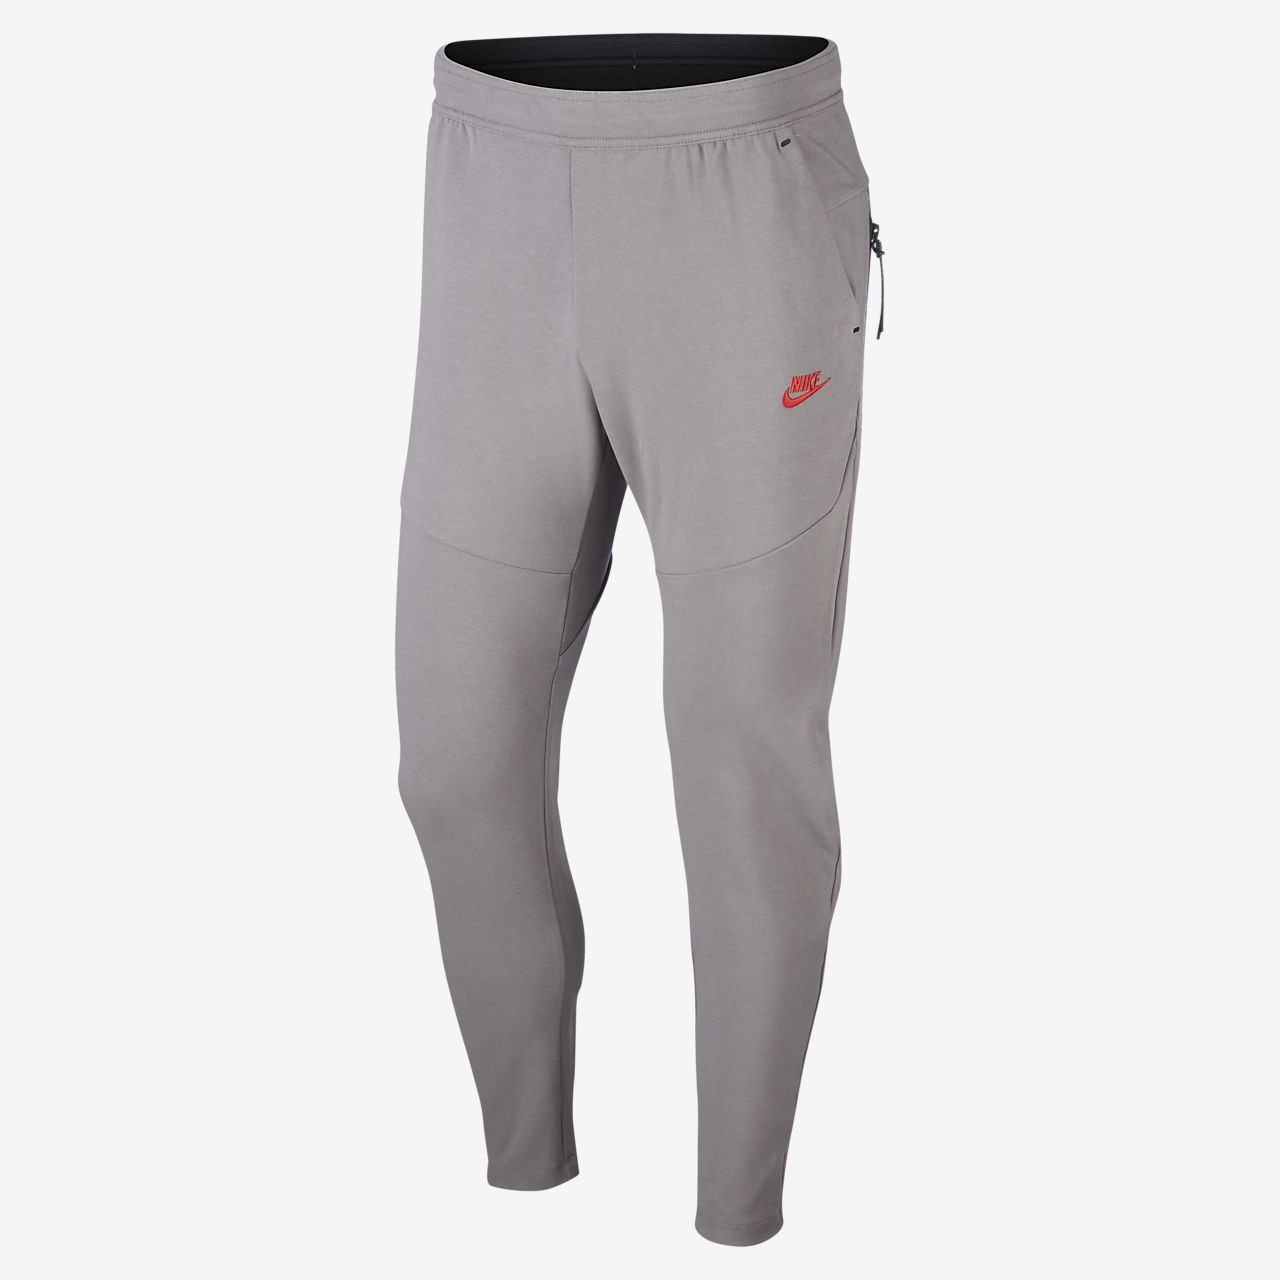 Pantalones de fútbol para hombre Atlético de Madrid Tech Pack